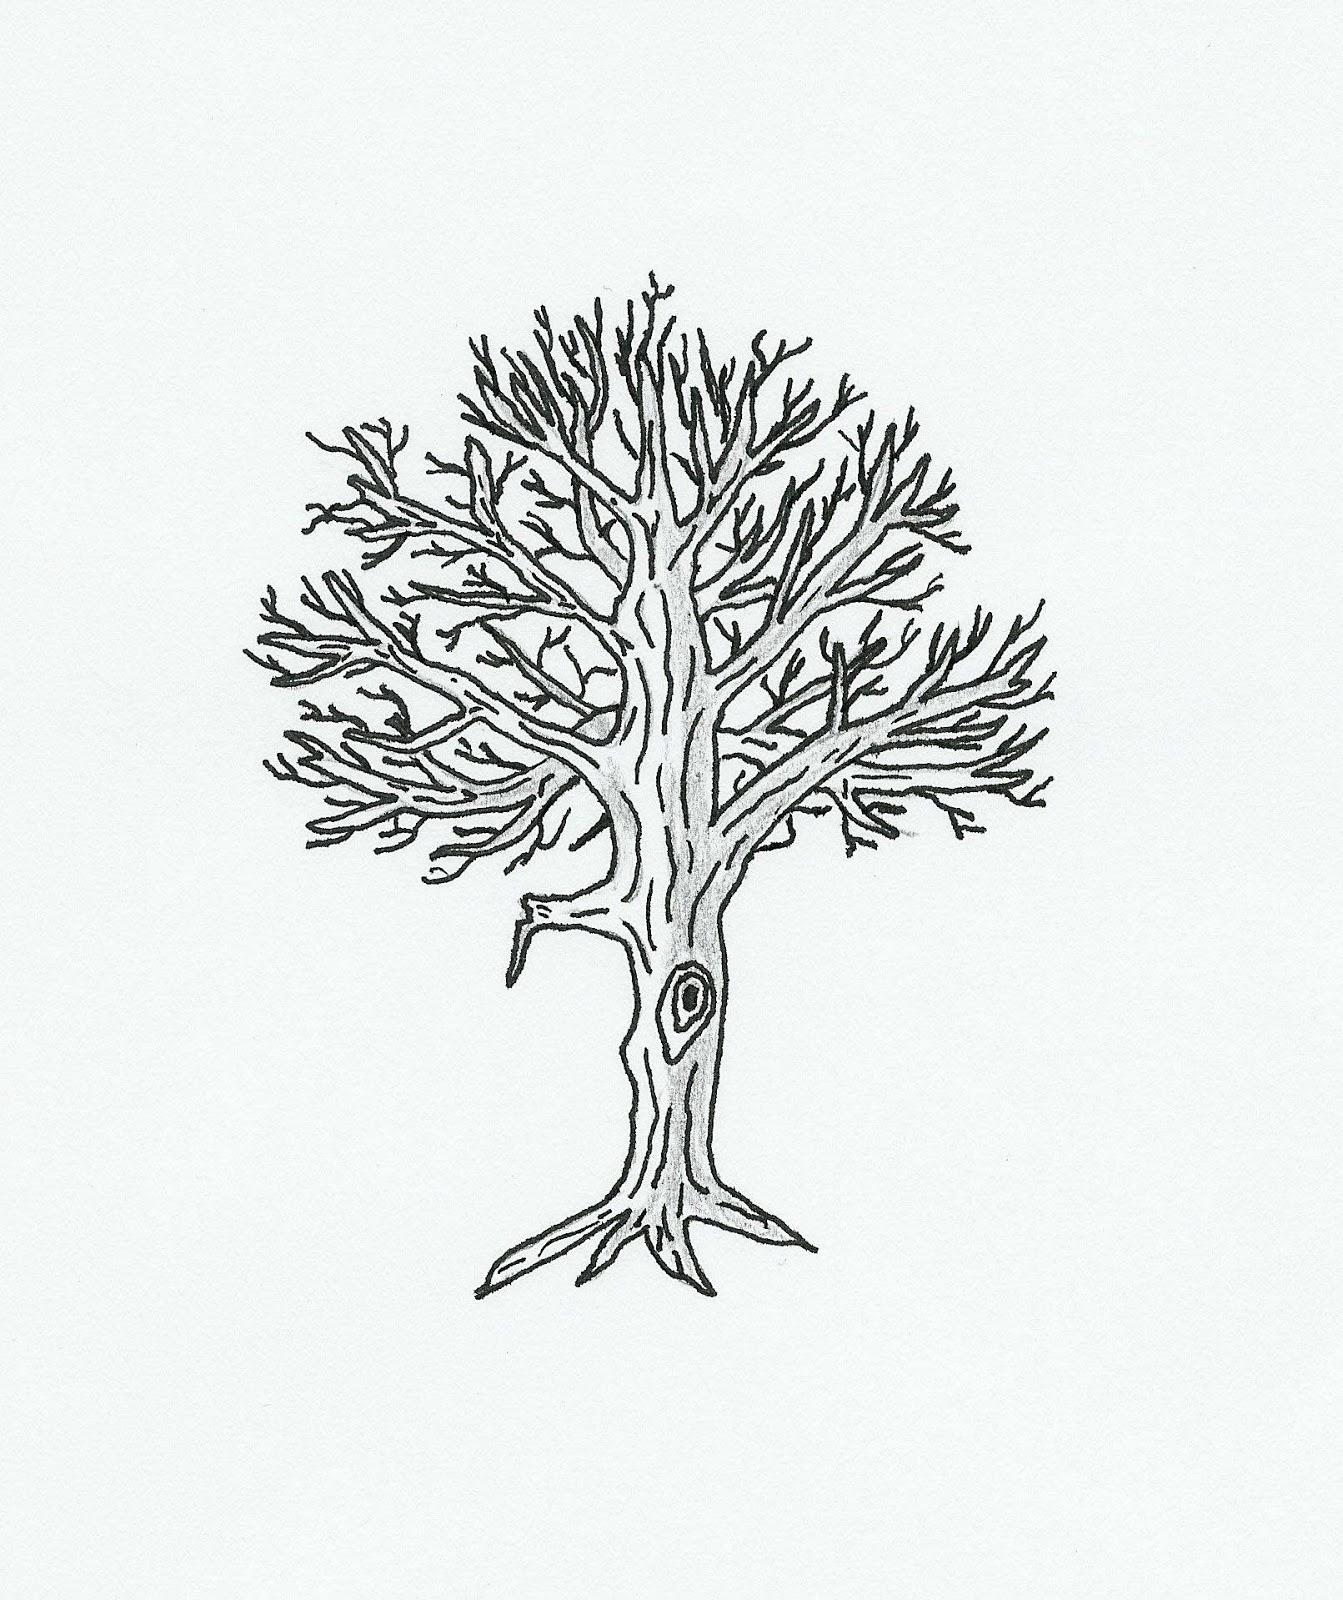 Tree Diagrams Worksheet Juanribon – Math Tree Diagram Worksheet